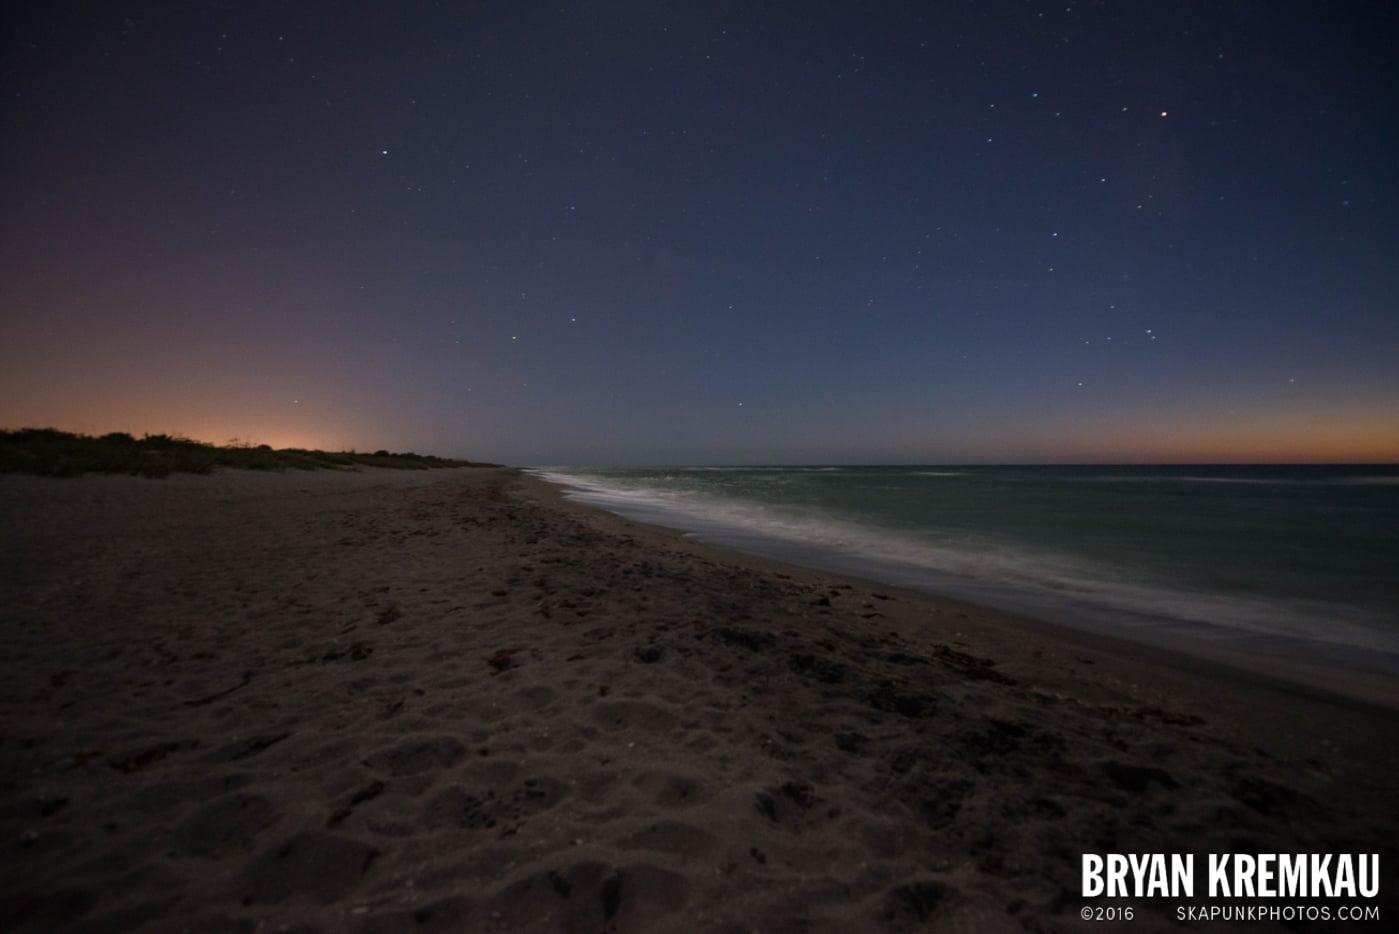 Sunsets, Astrophotography & Birds @ Venice, Florida - 10.25.14 - 11.5.14 (82)